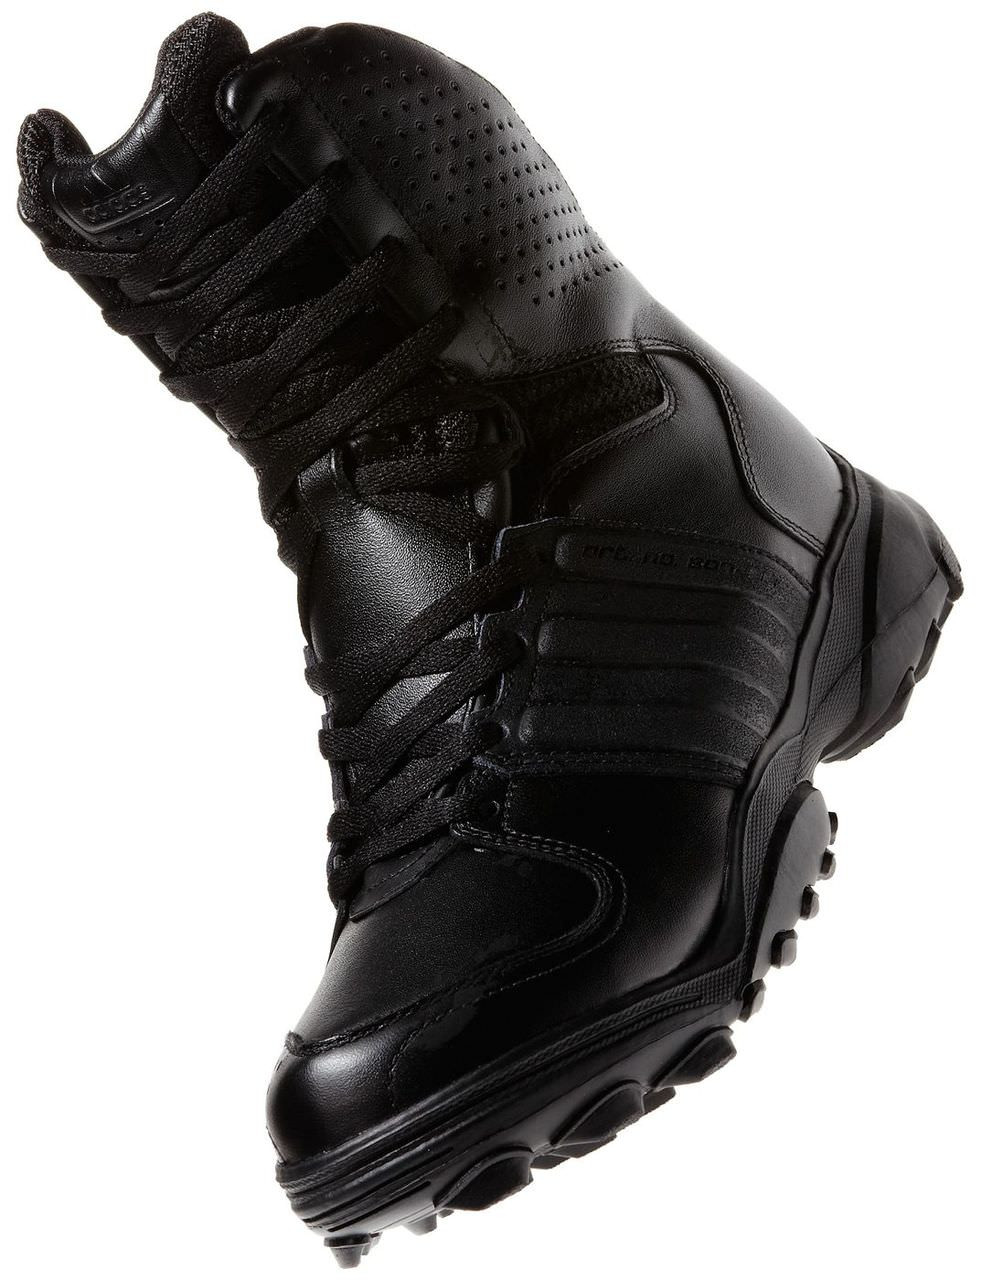 adidas gsg stivali, la libera navigazione & senza iva